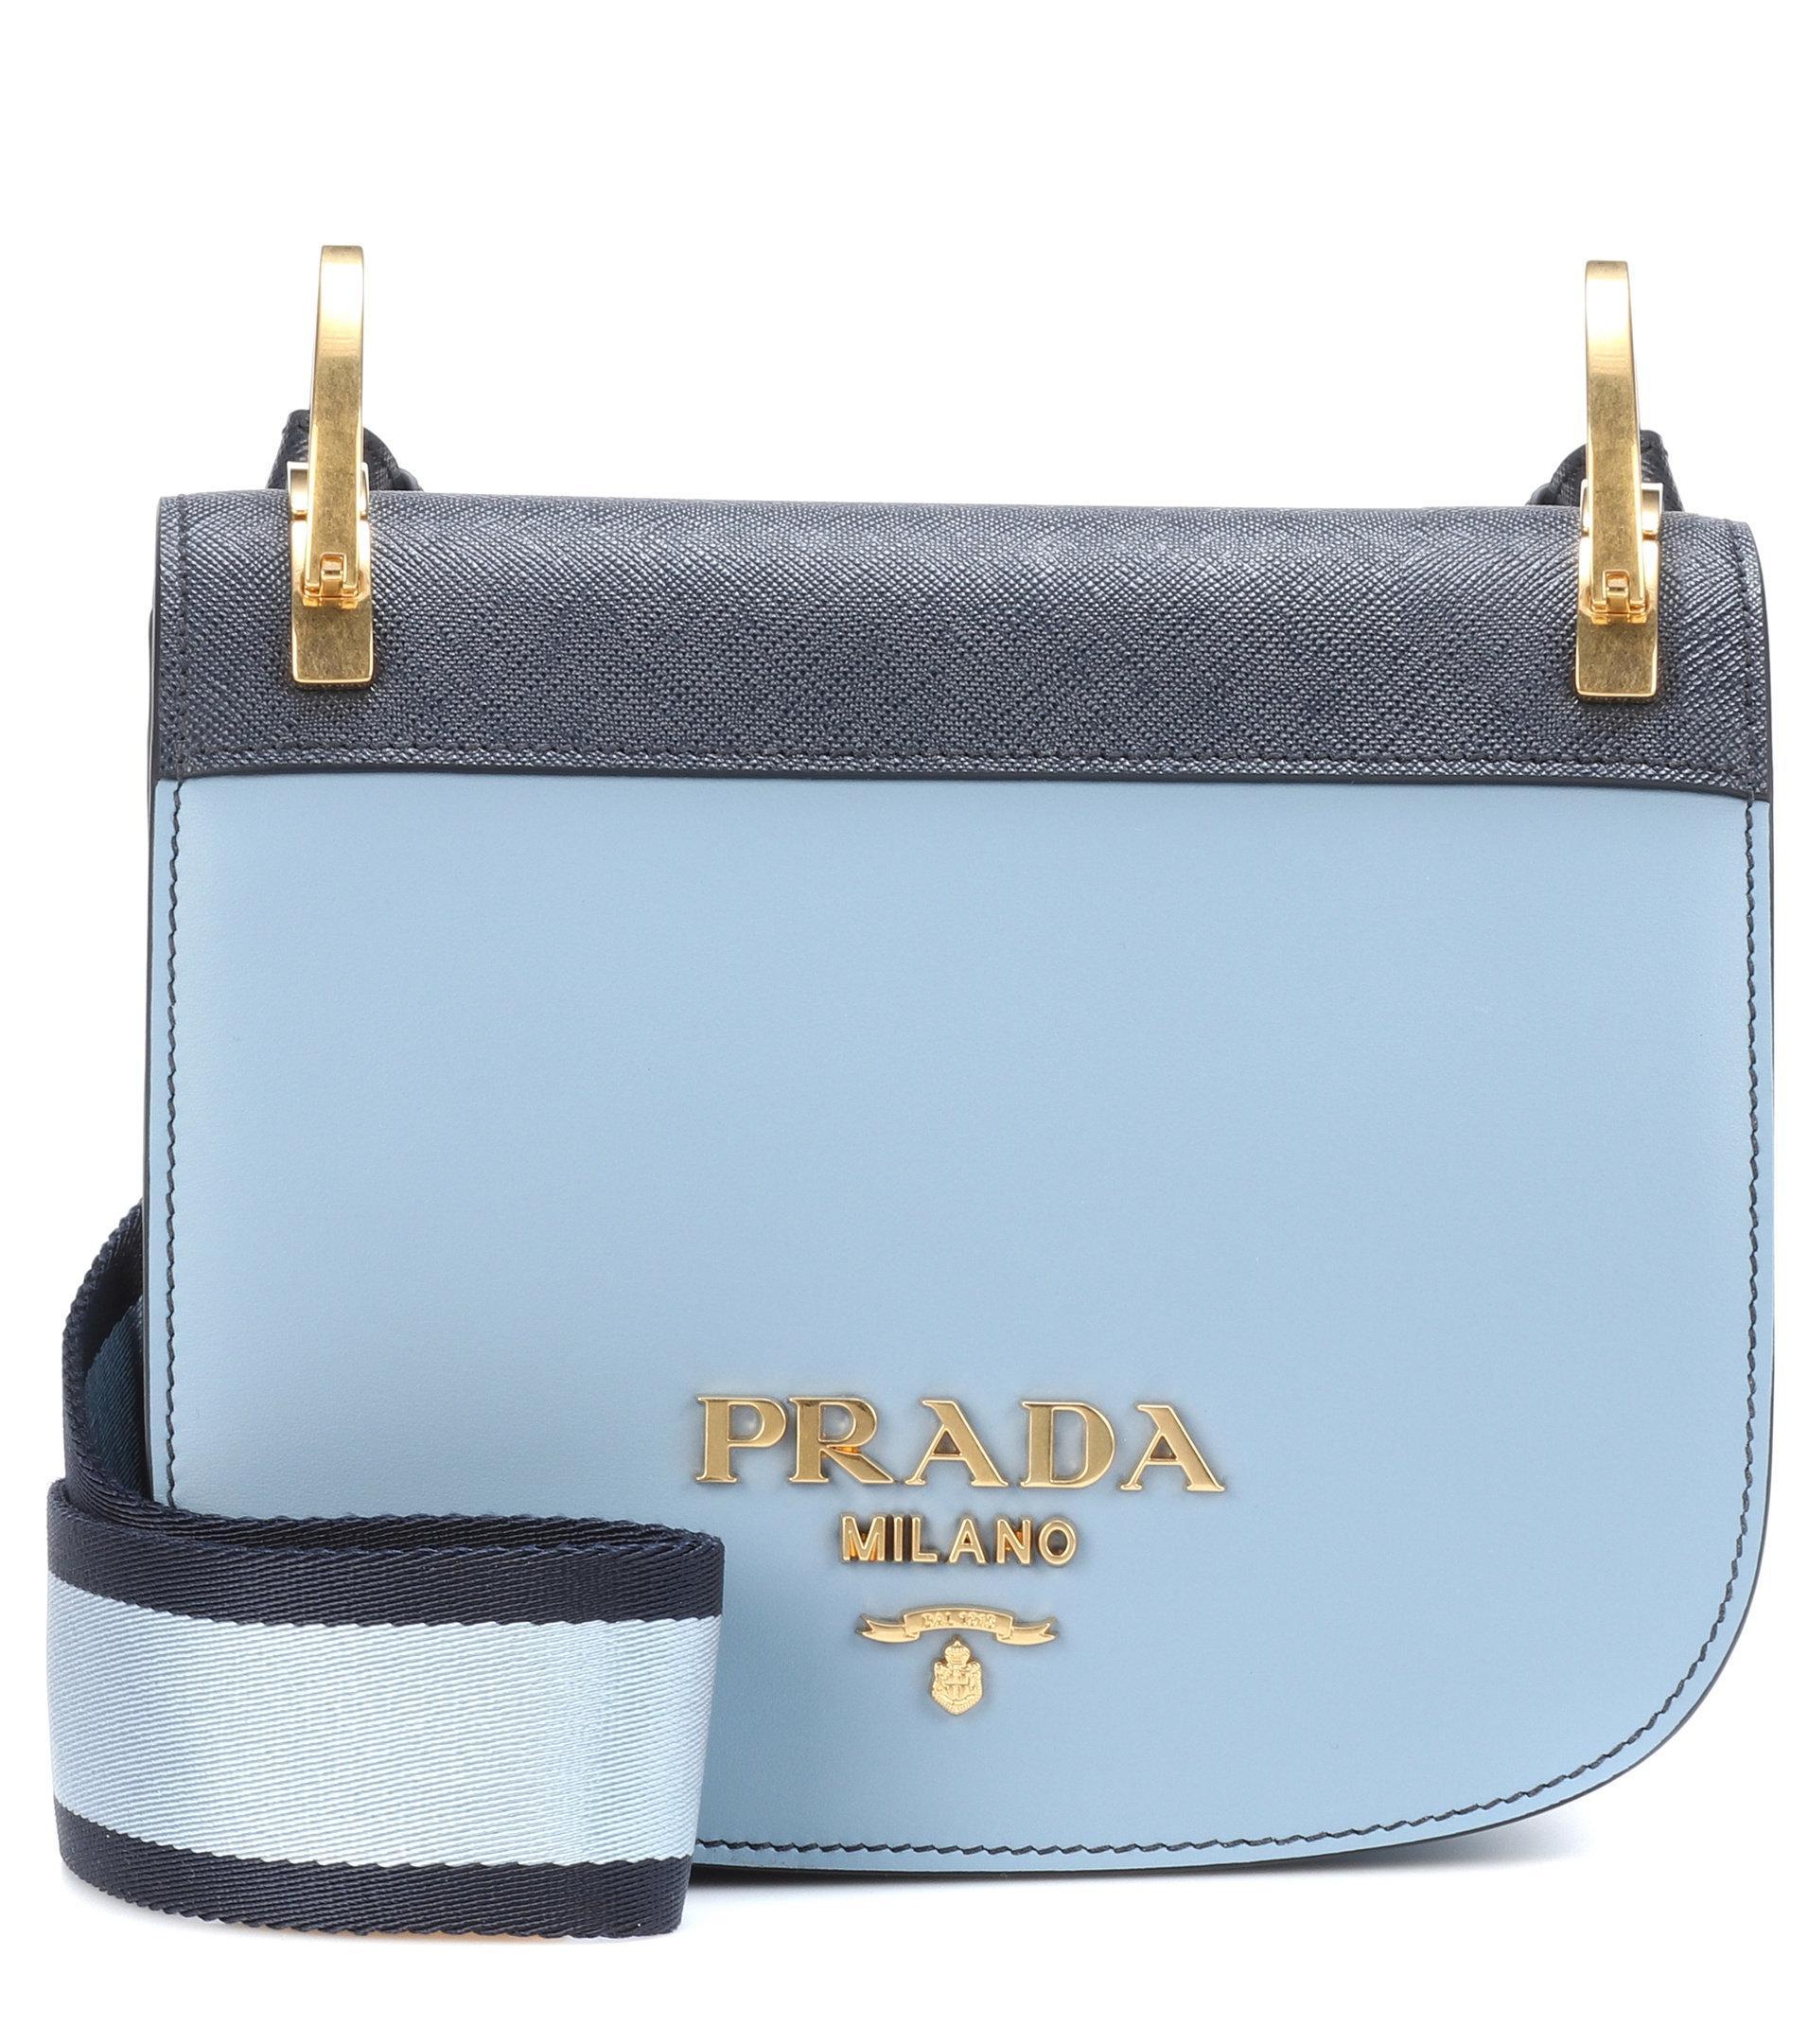 5d334189a75ae6 Prada Pionnière Leather Shoulder Bag in Blue - Lyst